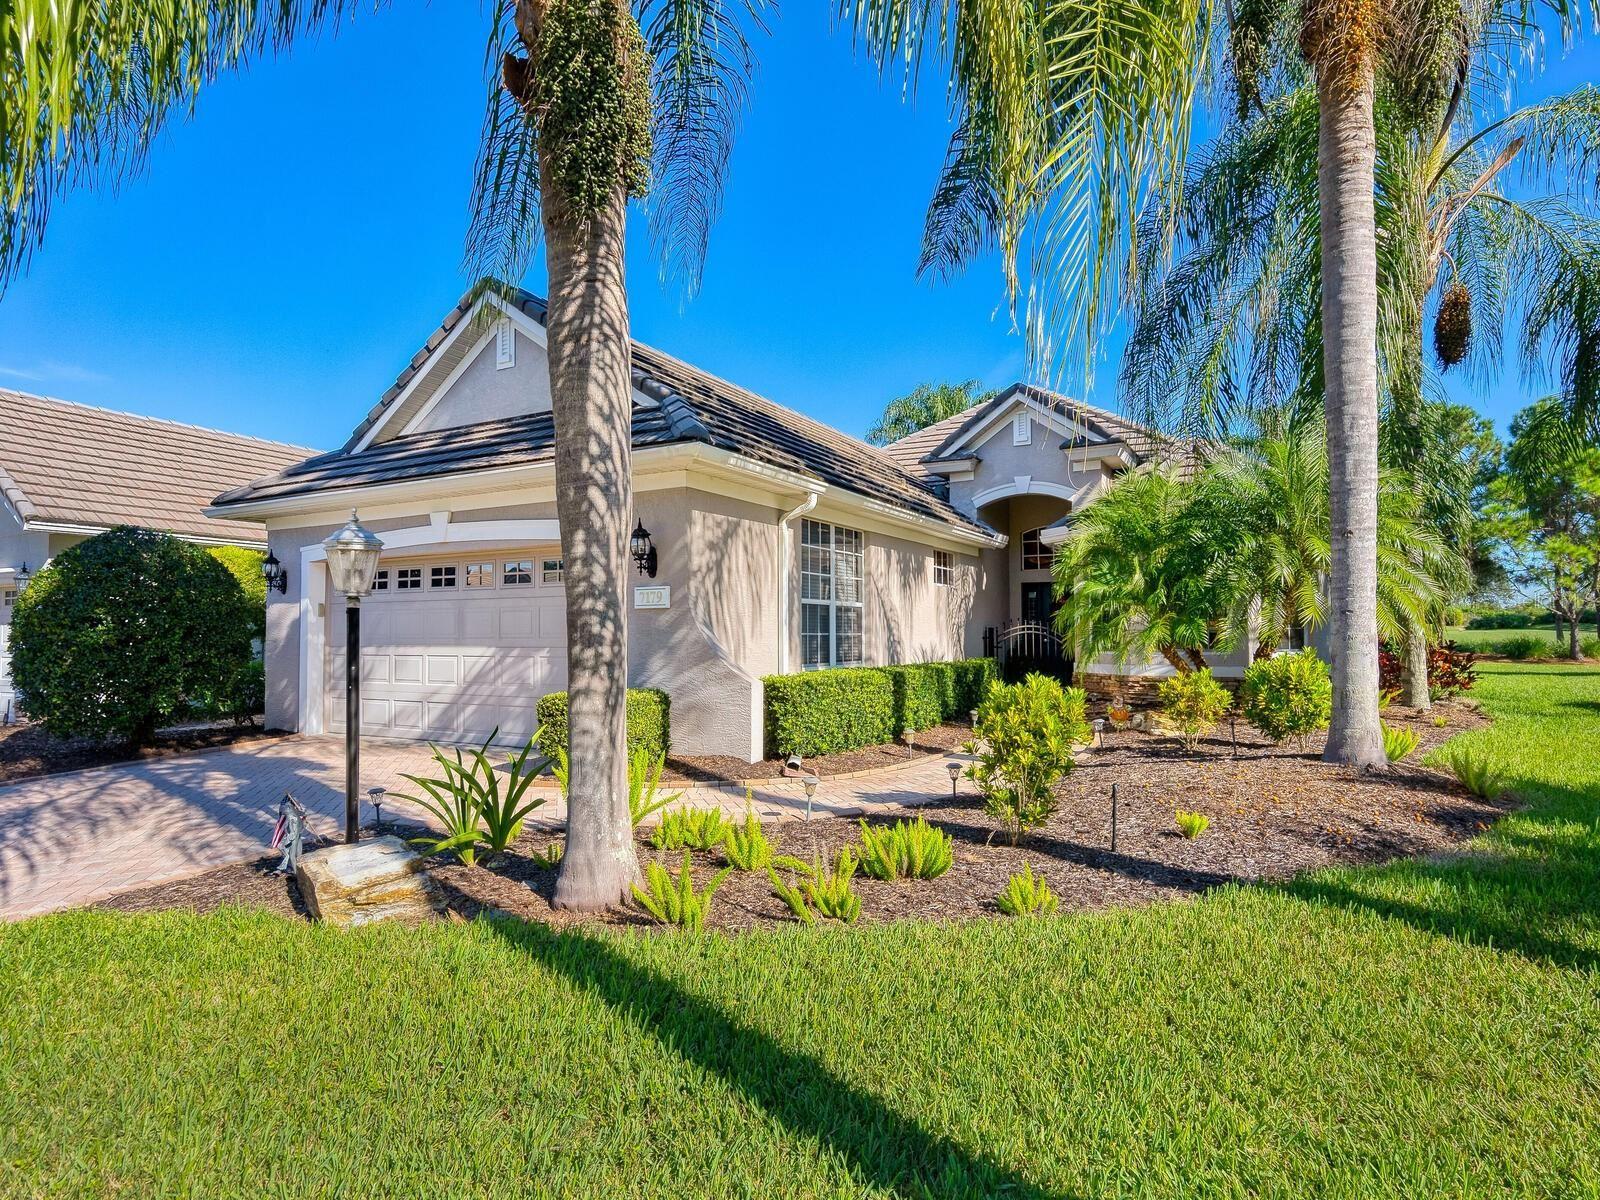 7179 SANDHILLS PLACE, Lakewood Ranch, FL 34202 - #: A4514392